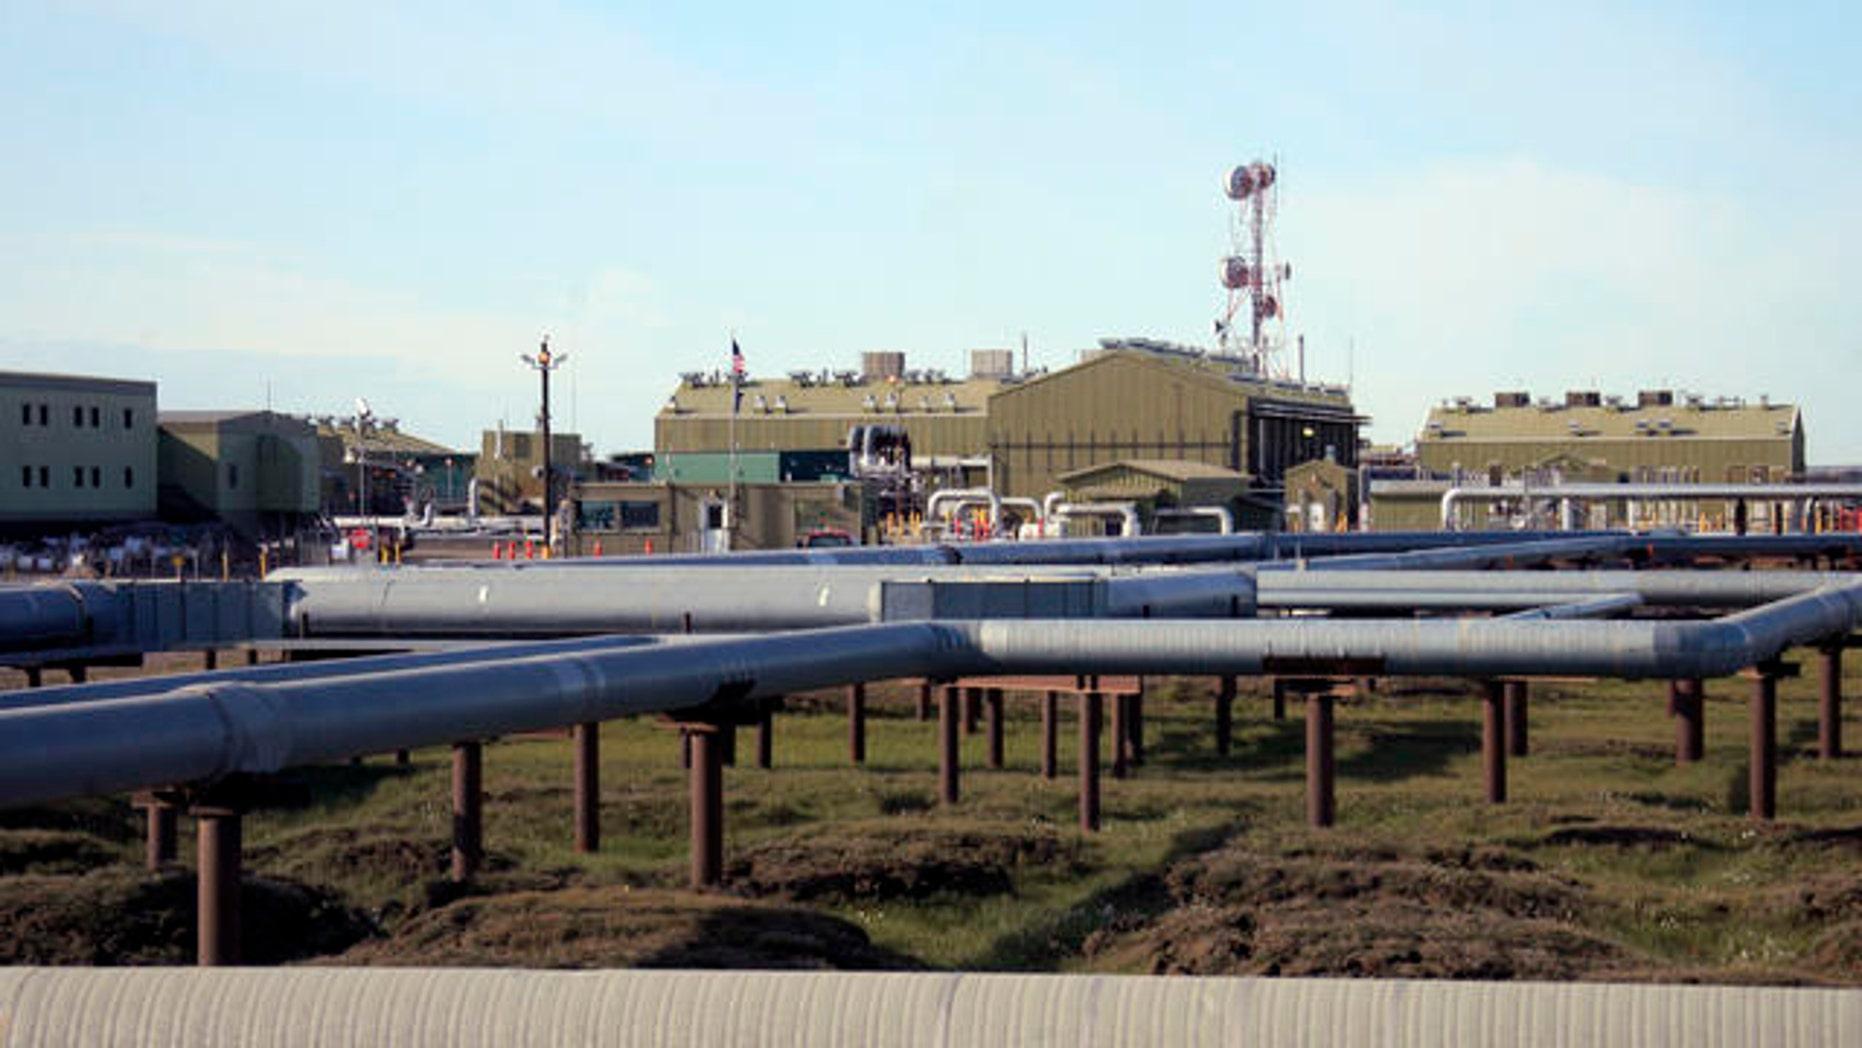 Shown here are oil and gas pipelines running into Alyeska's trans-Alaska oil pipeline pump station in Deadhorse, Alaska.